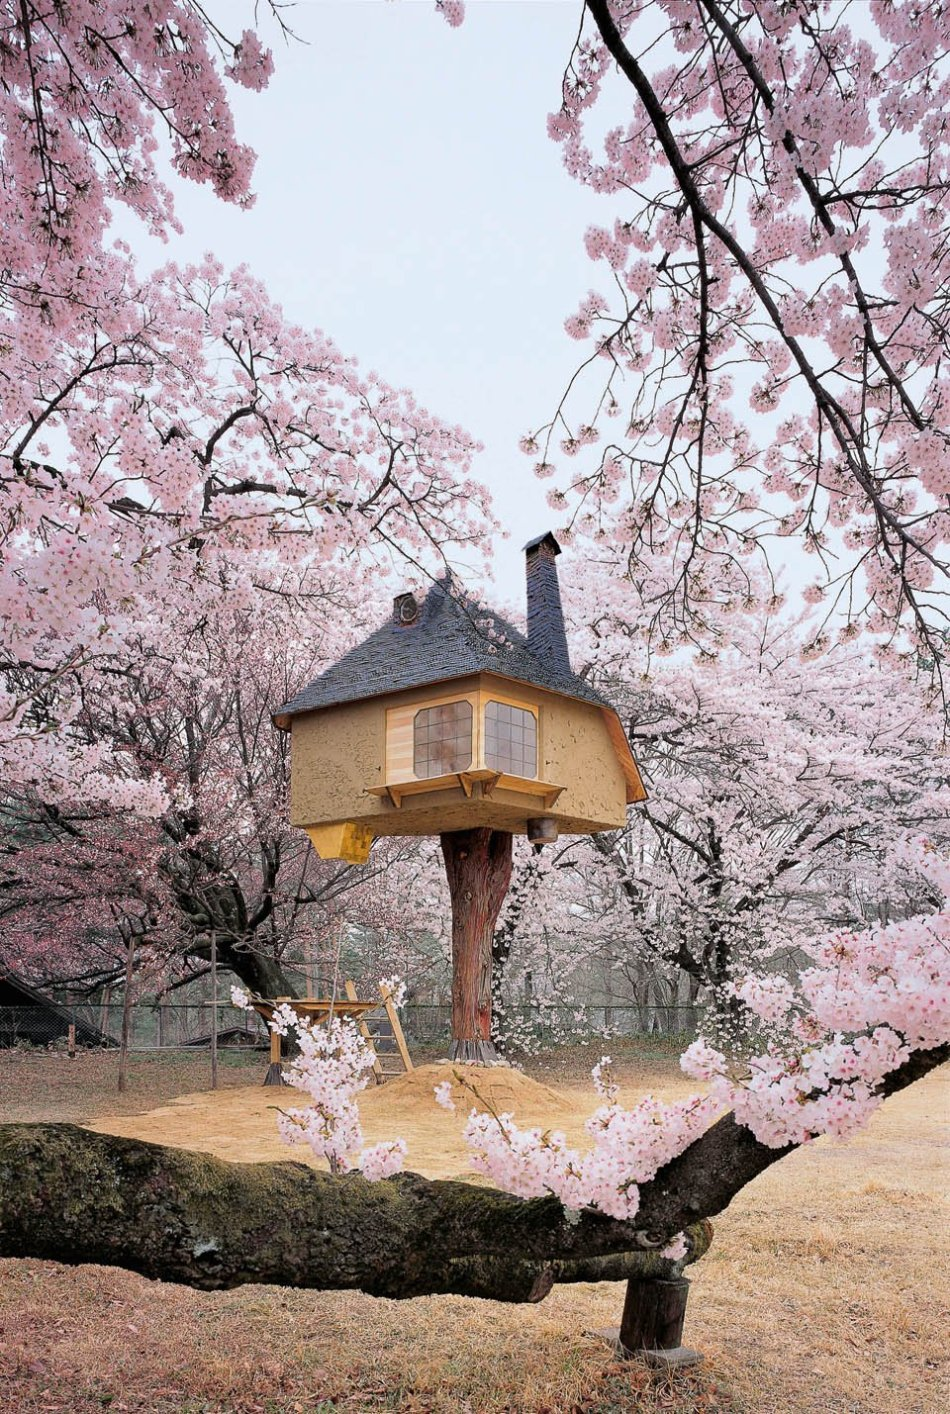 bu_tree_houses_473_1703281538_id_1120017